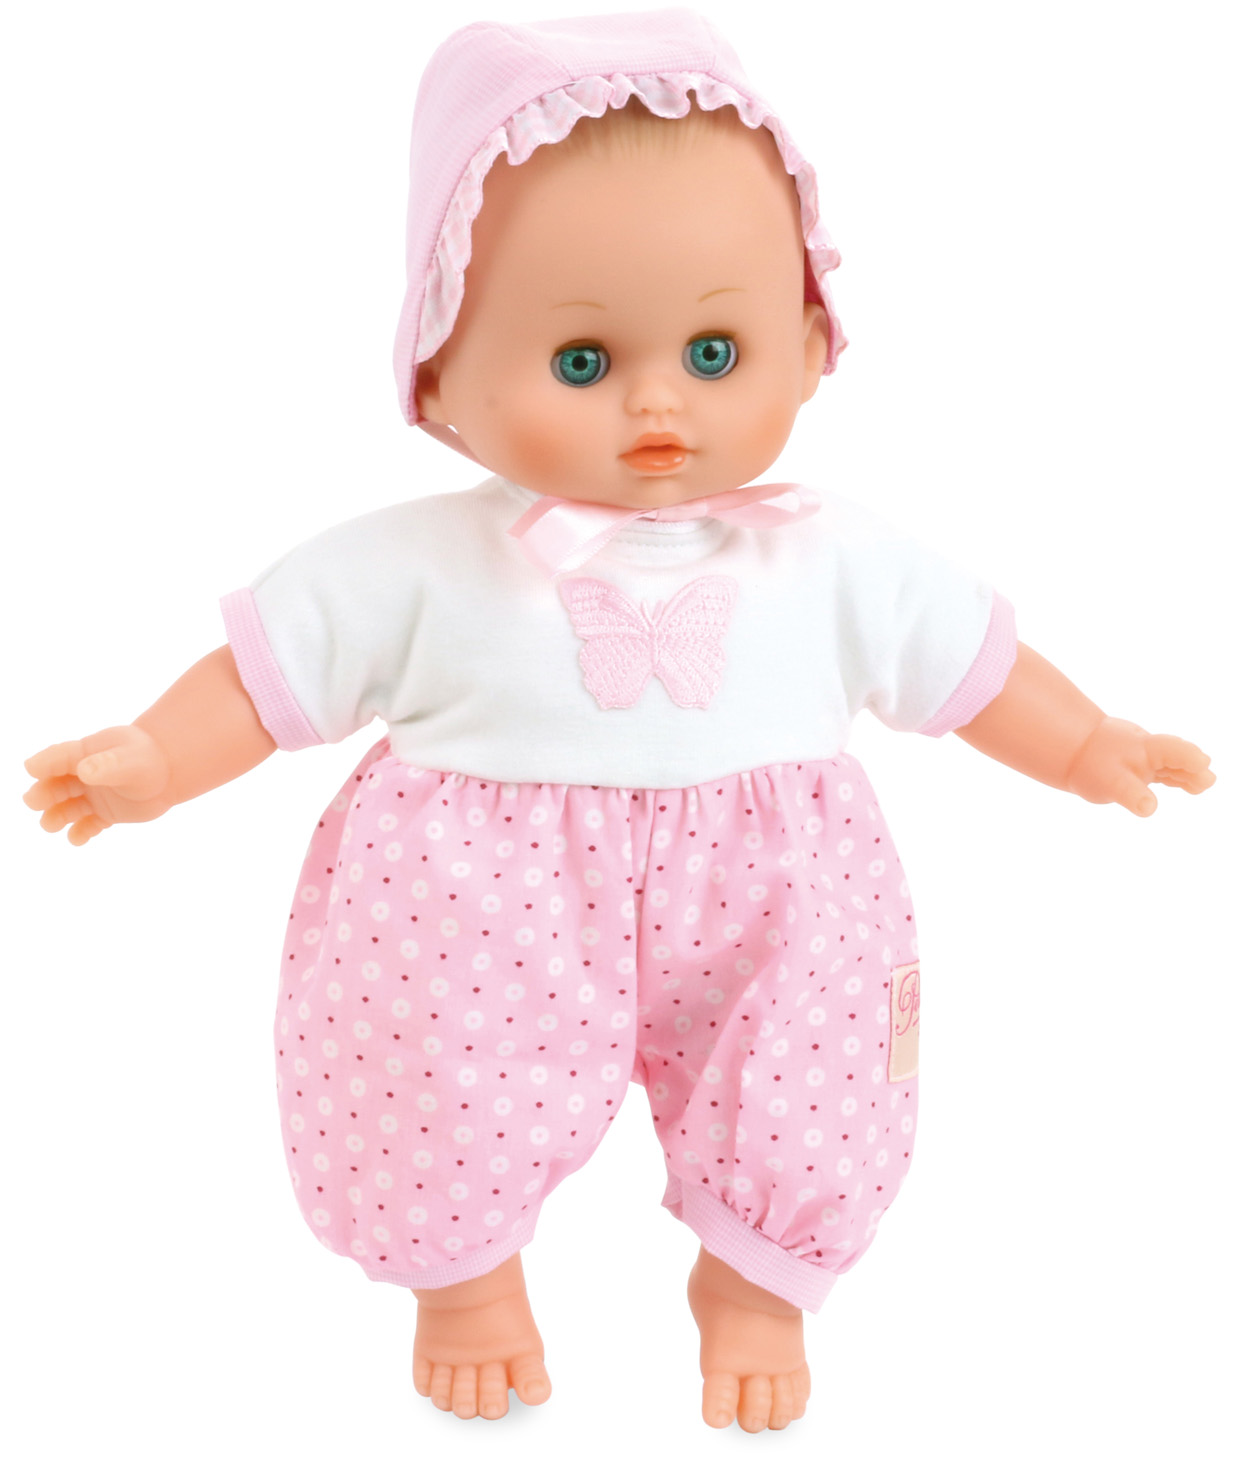 Petitcollin panenka Baby Doll 28 cm